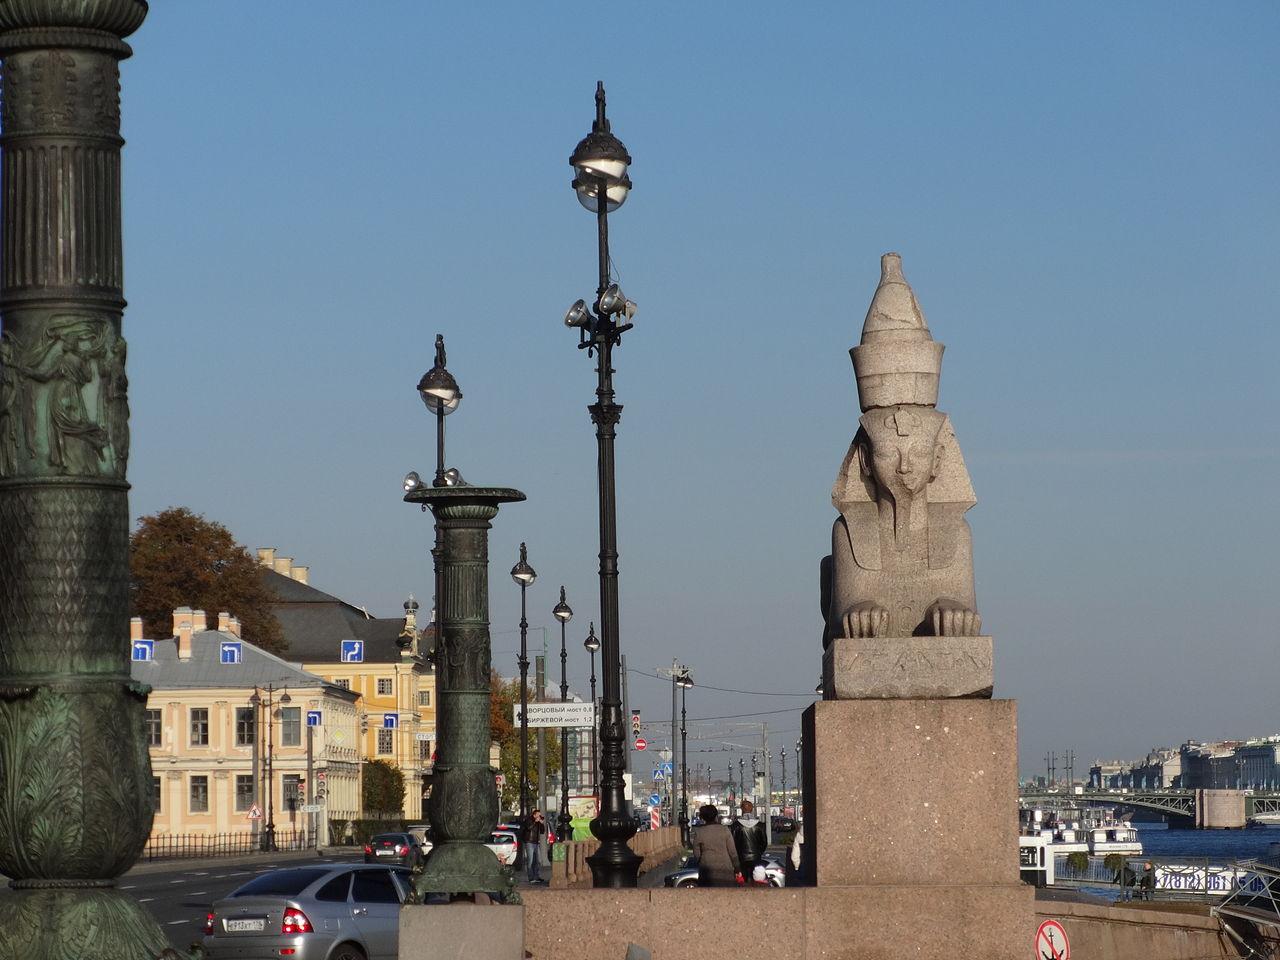 Пристань со сфинксами фараона Аменхотепа III в Санкт-Петербурге